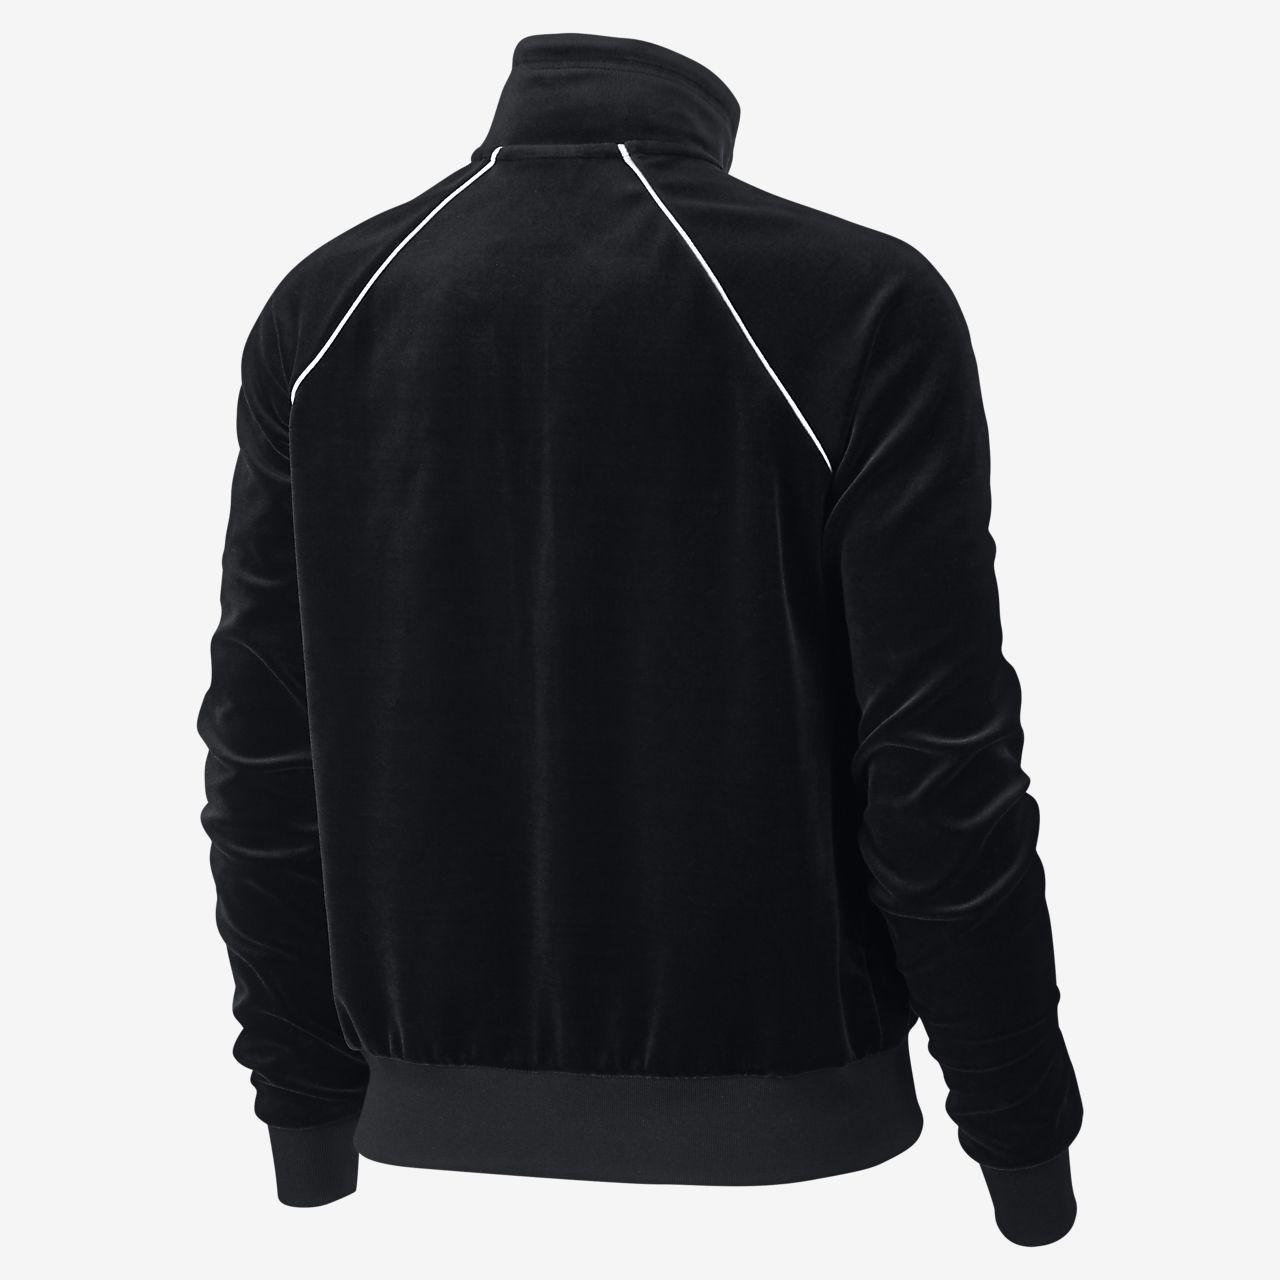 5cf85159b Nike Sportswear Women's Velour Track Jacket. Nike.com AU